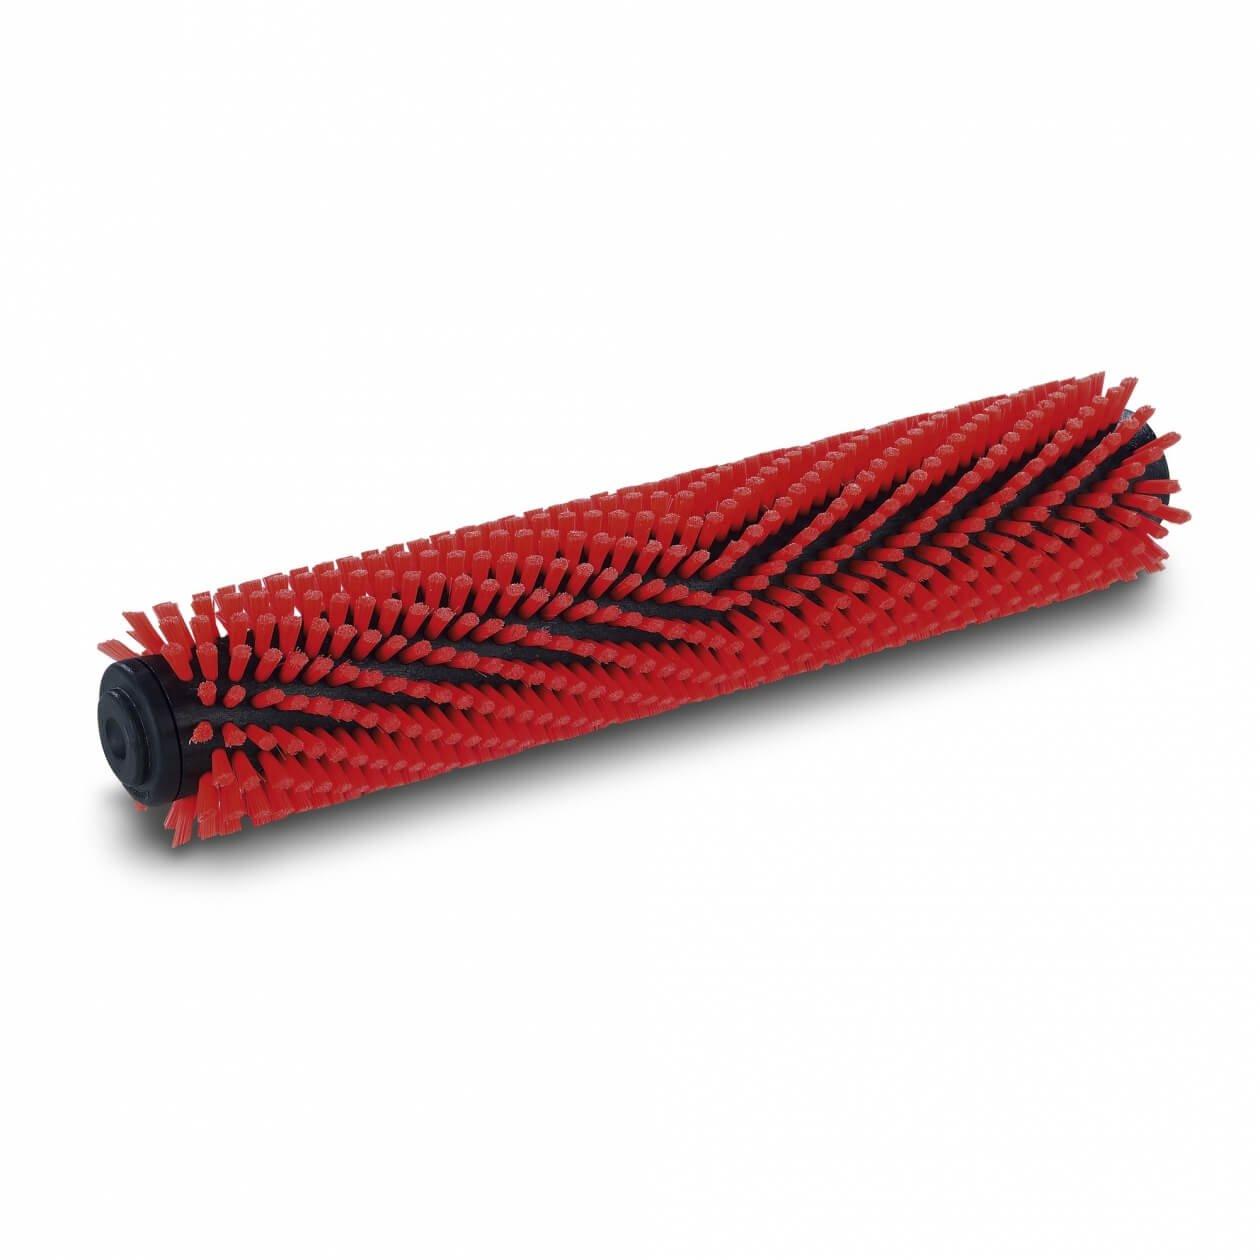 Image of   Kärcher, børstevalse, medium, rød, 300 mm - 47620050